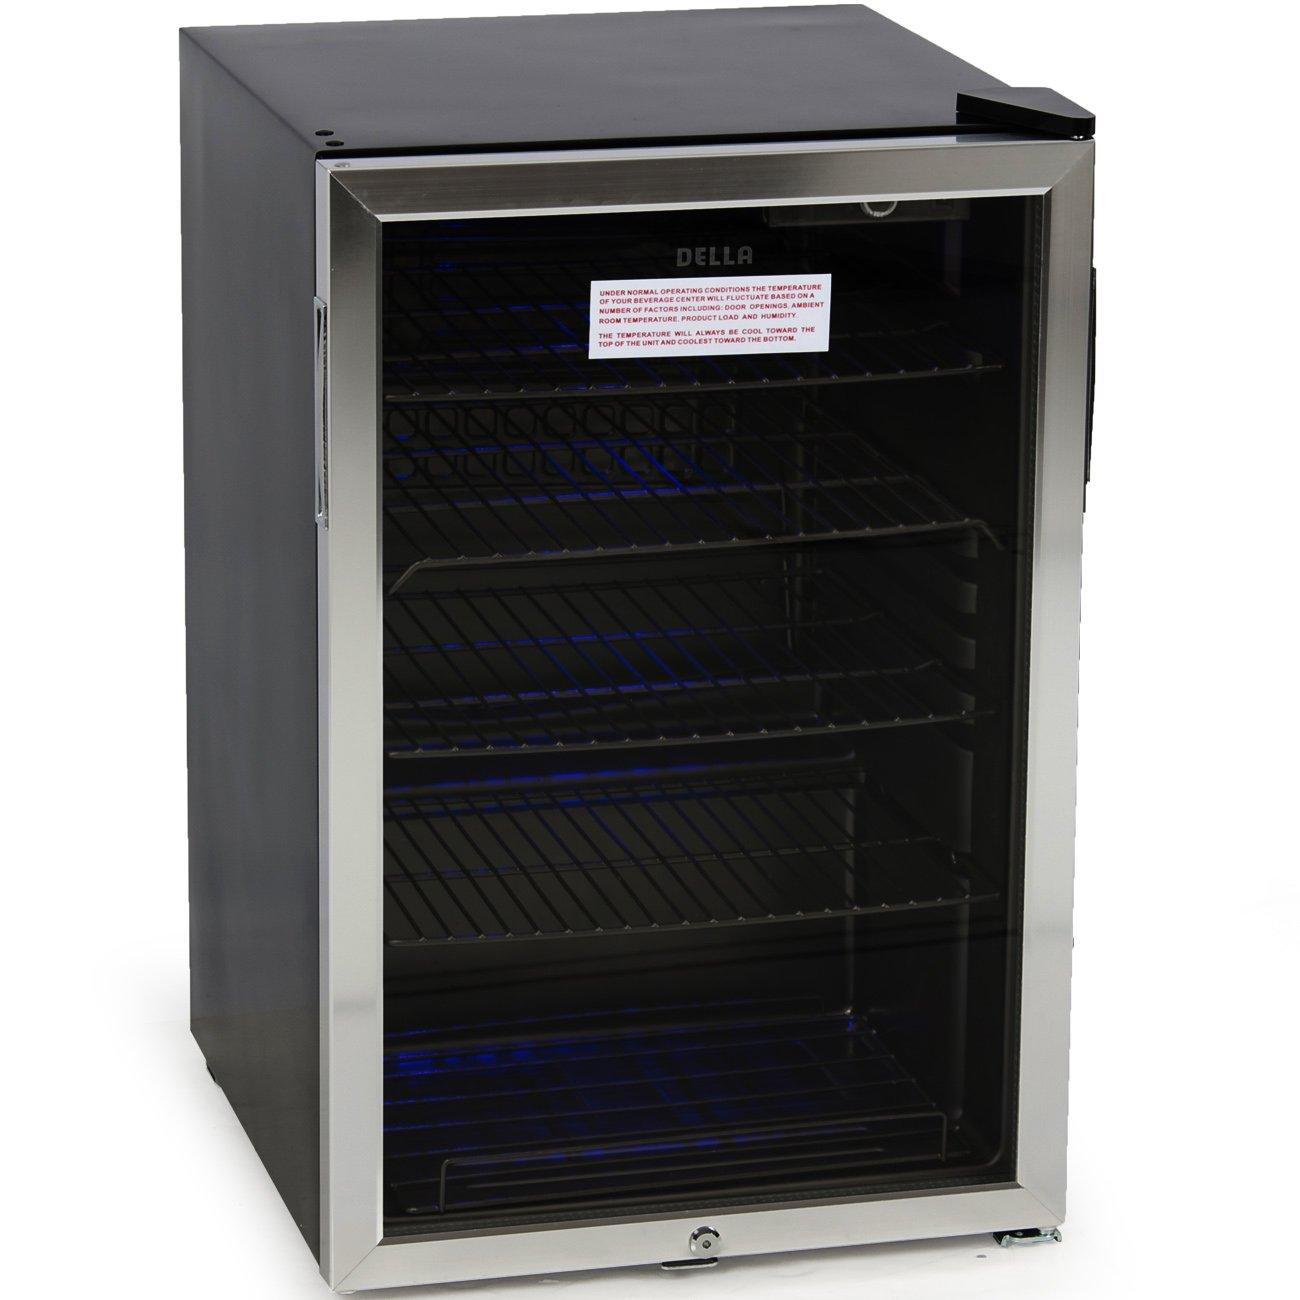 DELLA 048-GM-48197 Beverage Center Cool Built-In Cooler Mini Refrigerator w/ Lock- Black/Stainless Steel